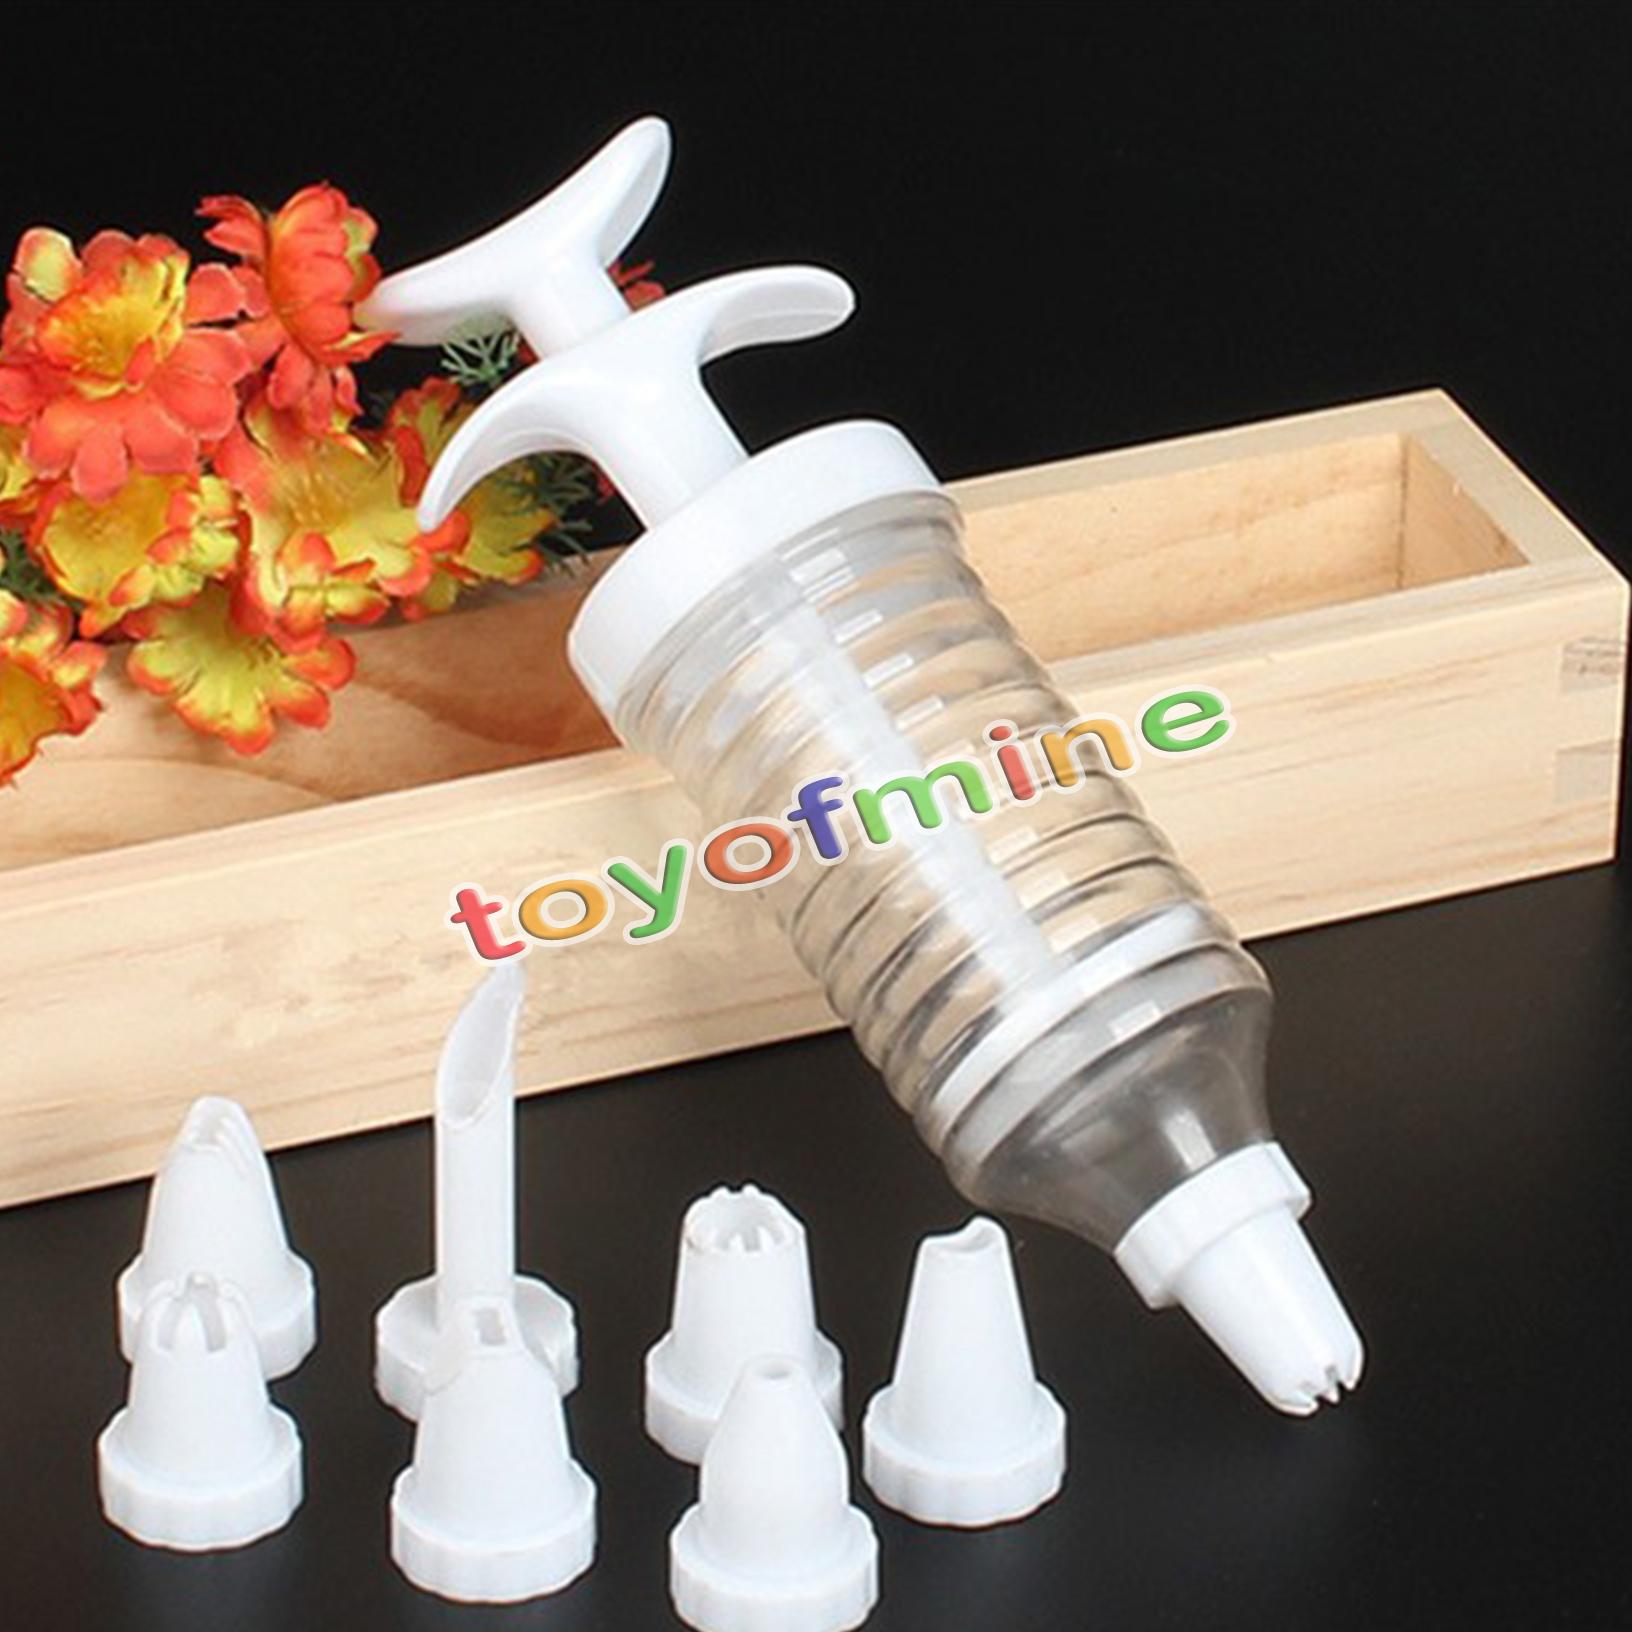 Cake Decorating Kit with 8 Tips Nozzles Icing Syringe Piping Sets Bakeware Tools eBay